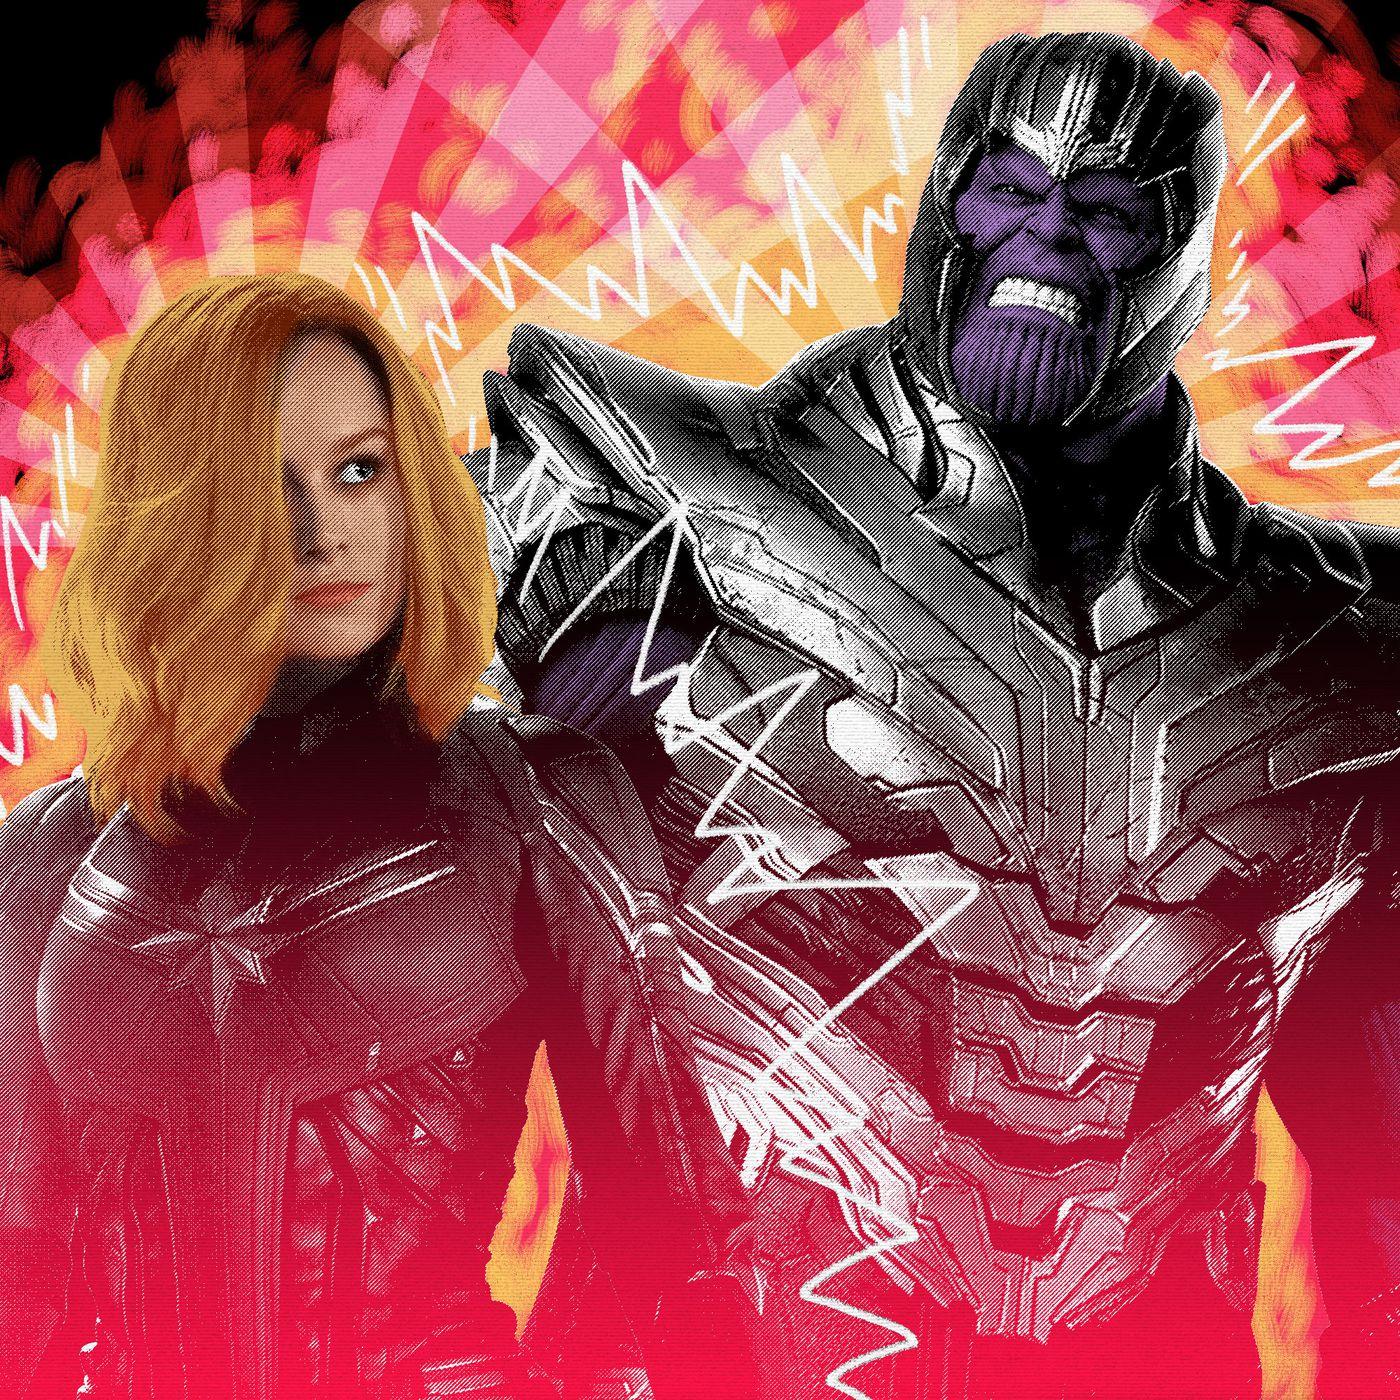 Marvel Super Hero Squad Avengers End Game Nick Fury Two Guns